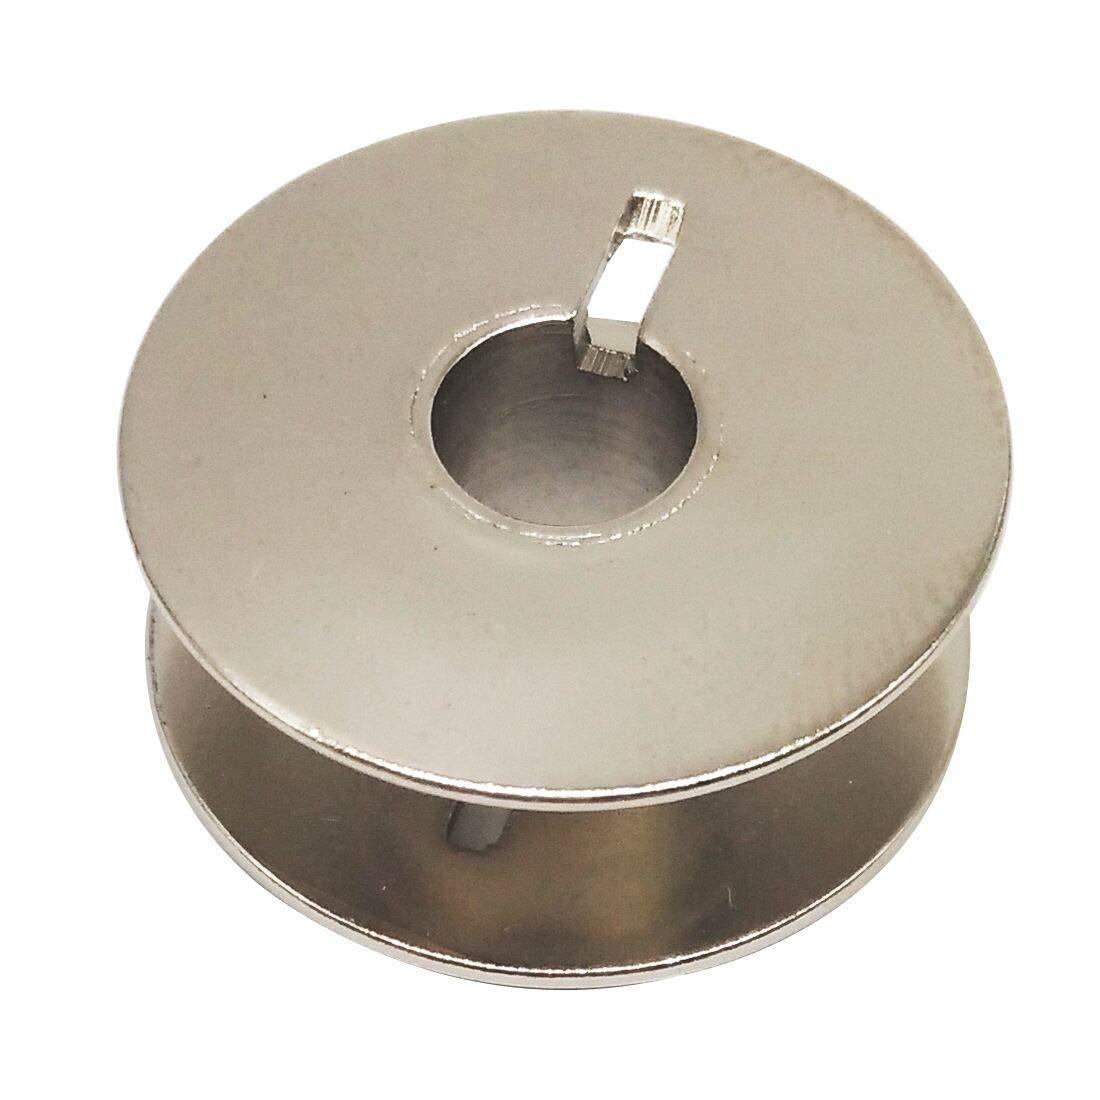 HONEYSEW 25pcs MetalL Bobbins #55623S for Bernina Brother Consew Babylock #SA159